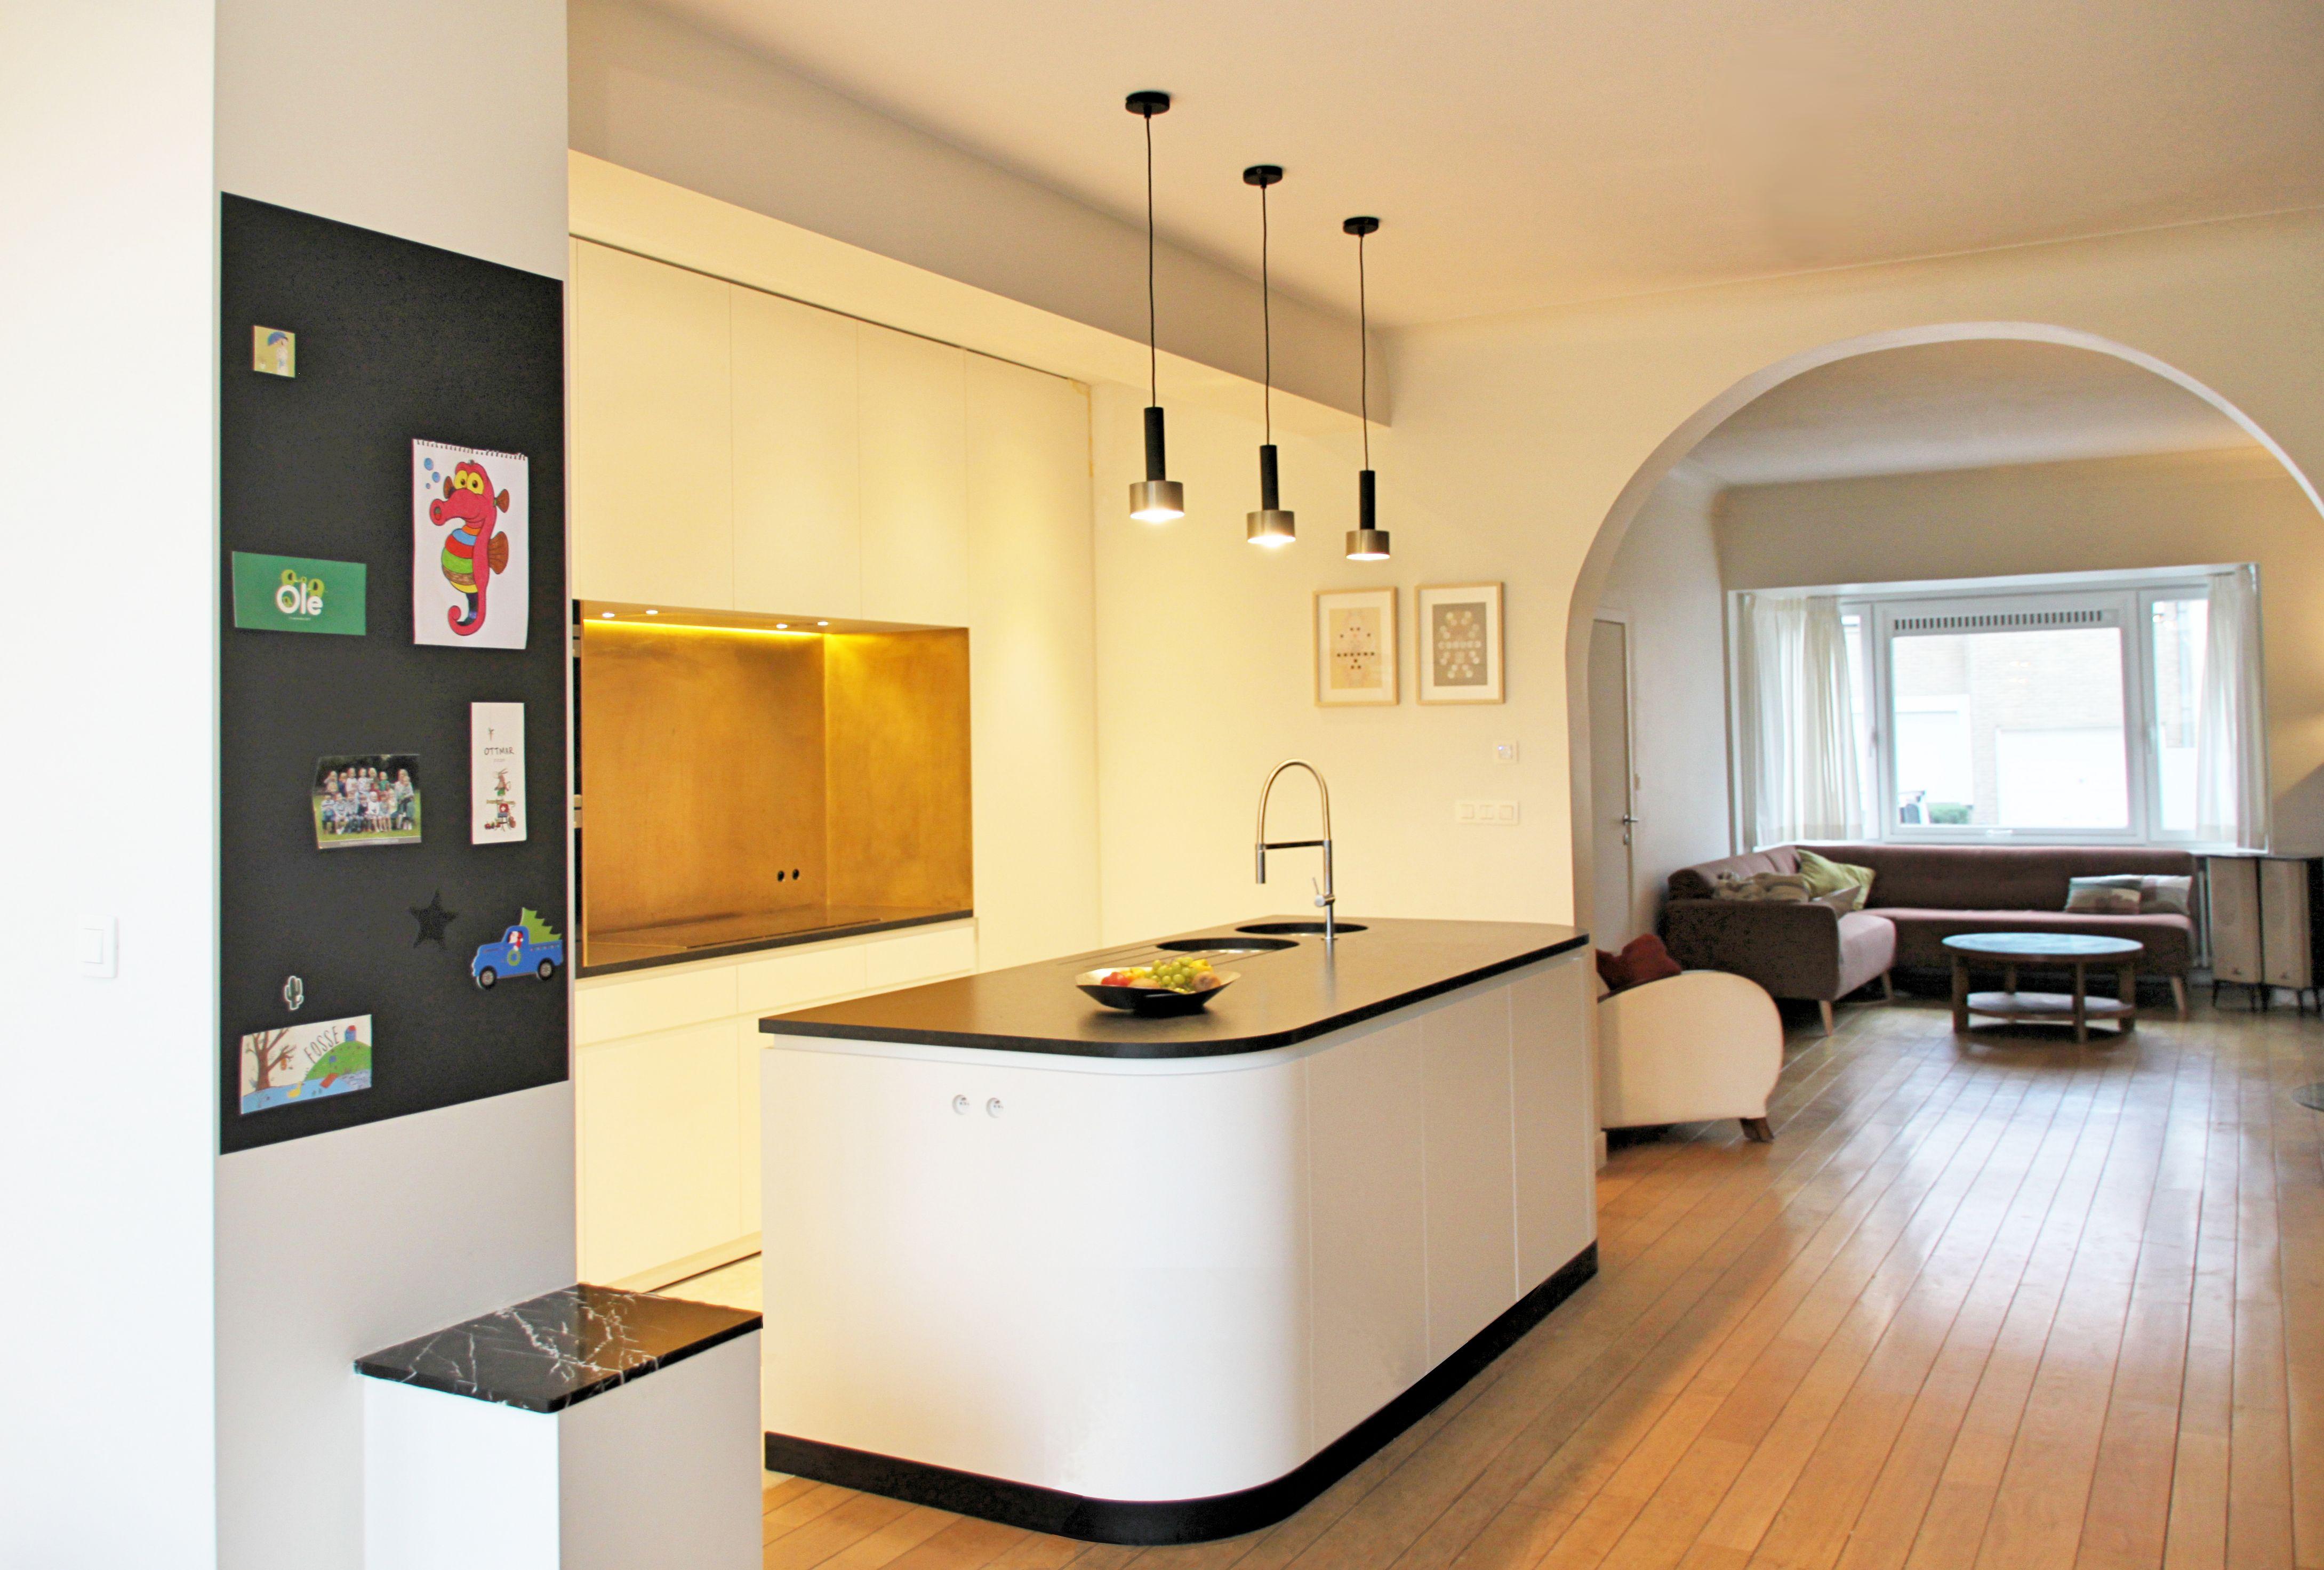 Interieur open keuken renovatie messing eik parket keukeneiland